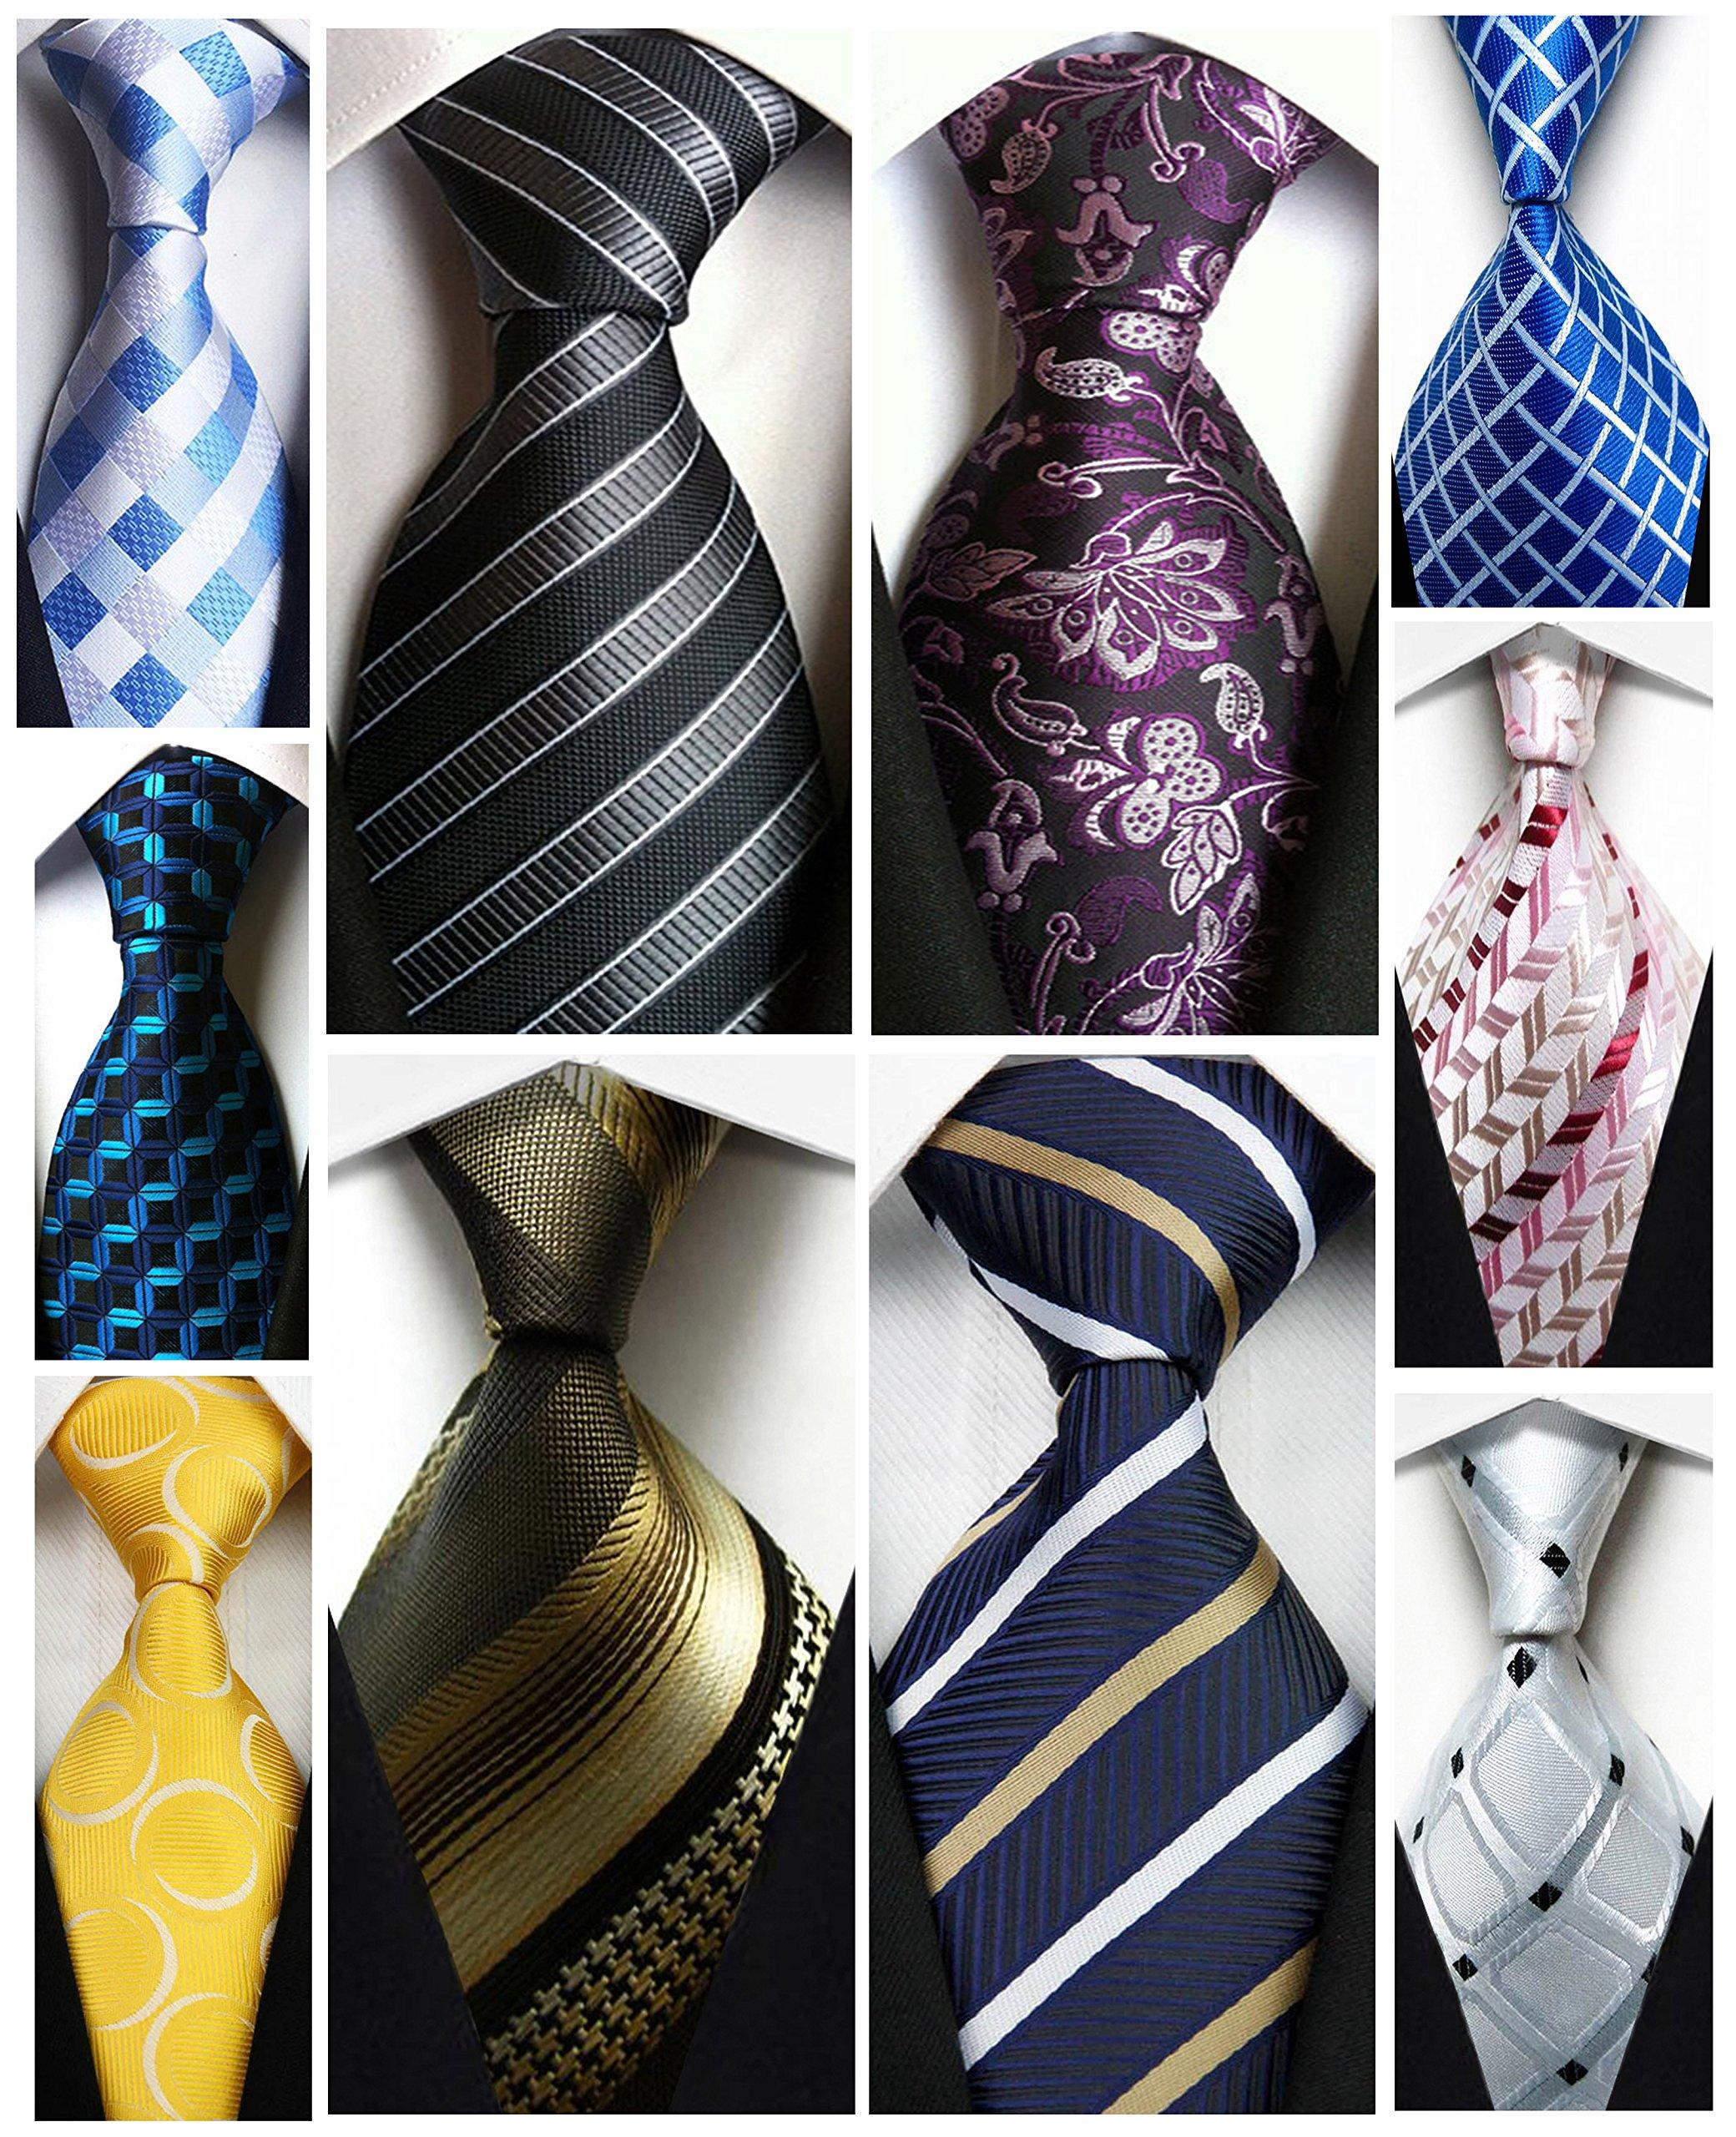 Wehug Lot 10 PCS Men's Ties 100% Silk Tie Woven Slim Necktie Jacquard Neck Ties Classic Ties style002